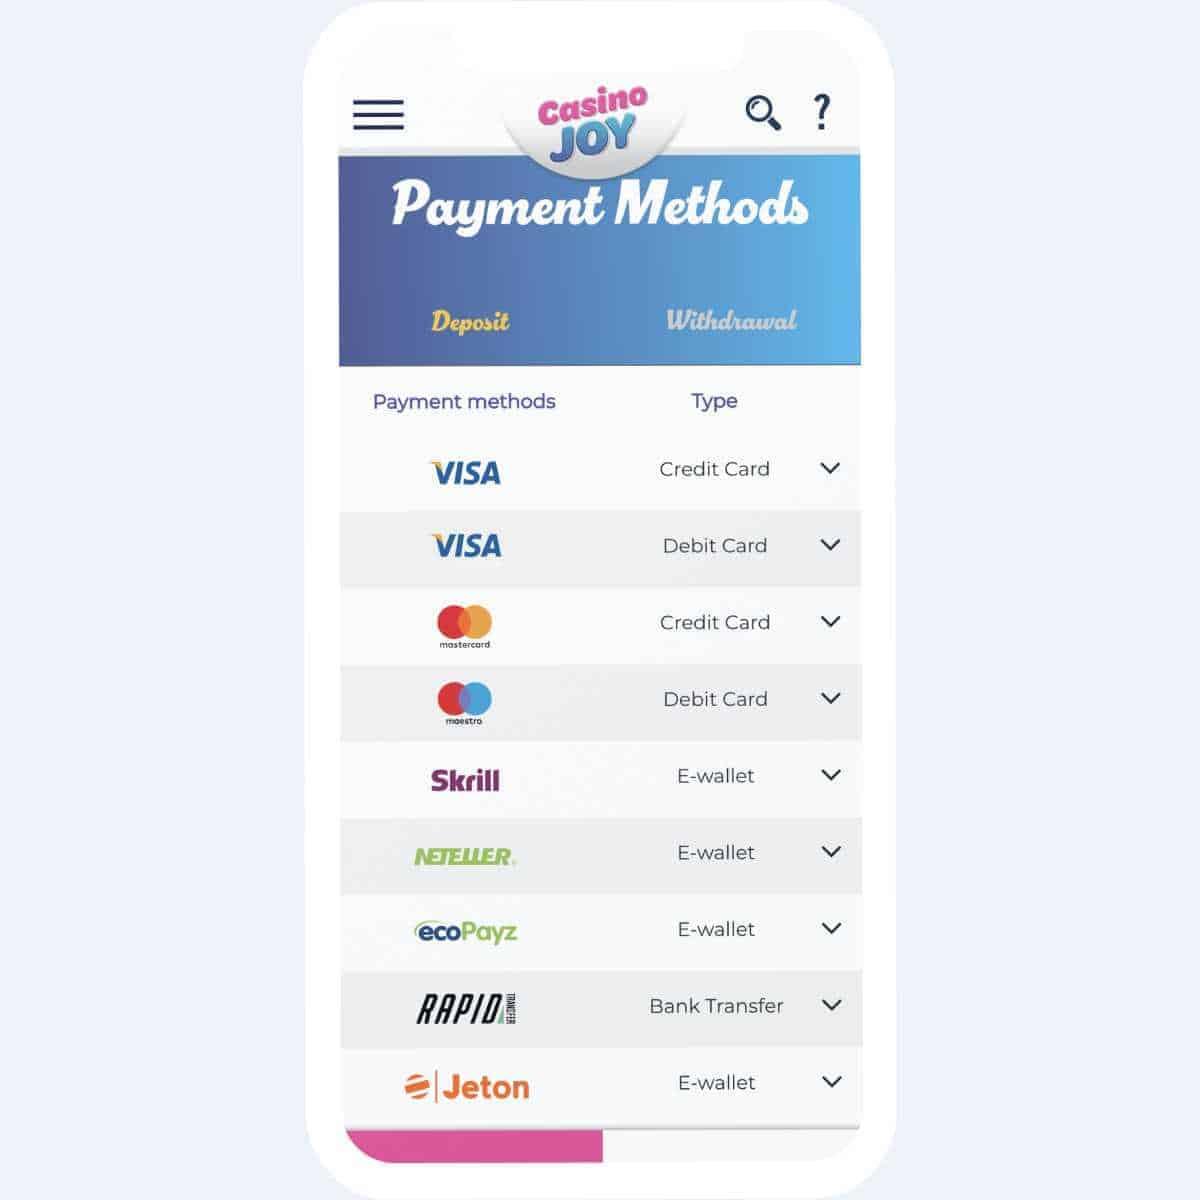 Casino Joy payment methods